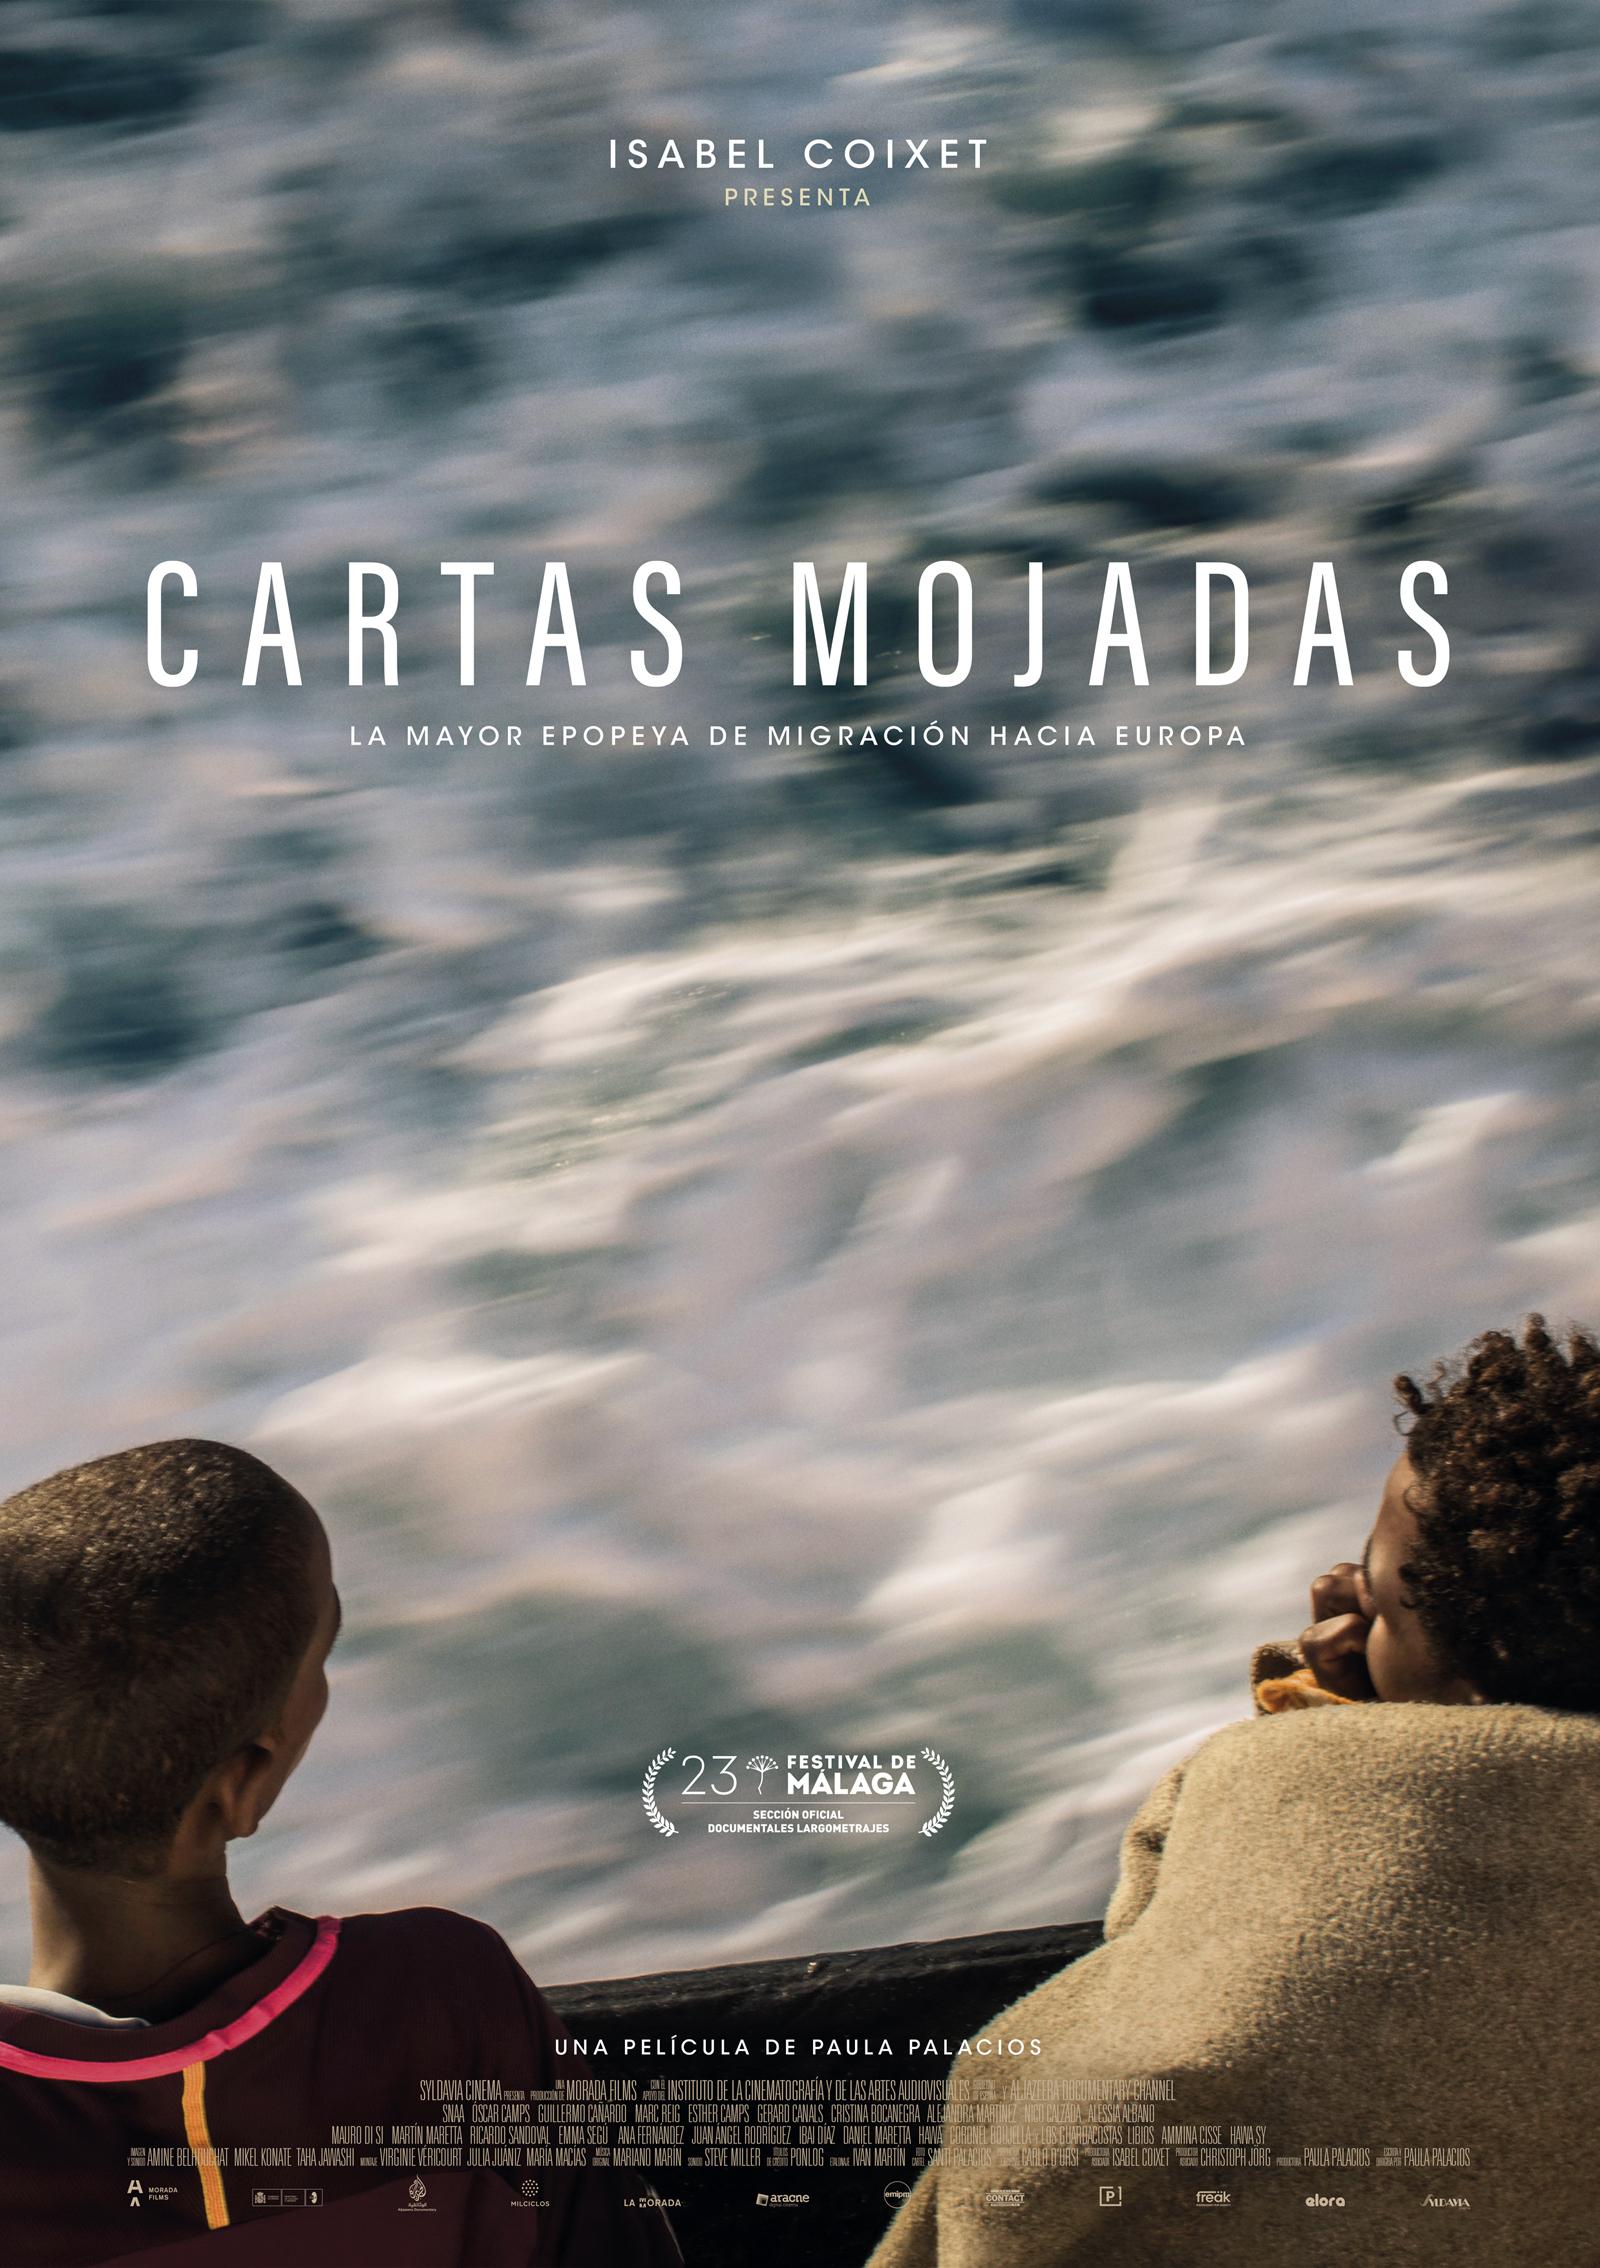 Pedro Cabañas - Design - CARTAS MOJADAS